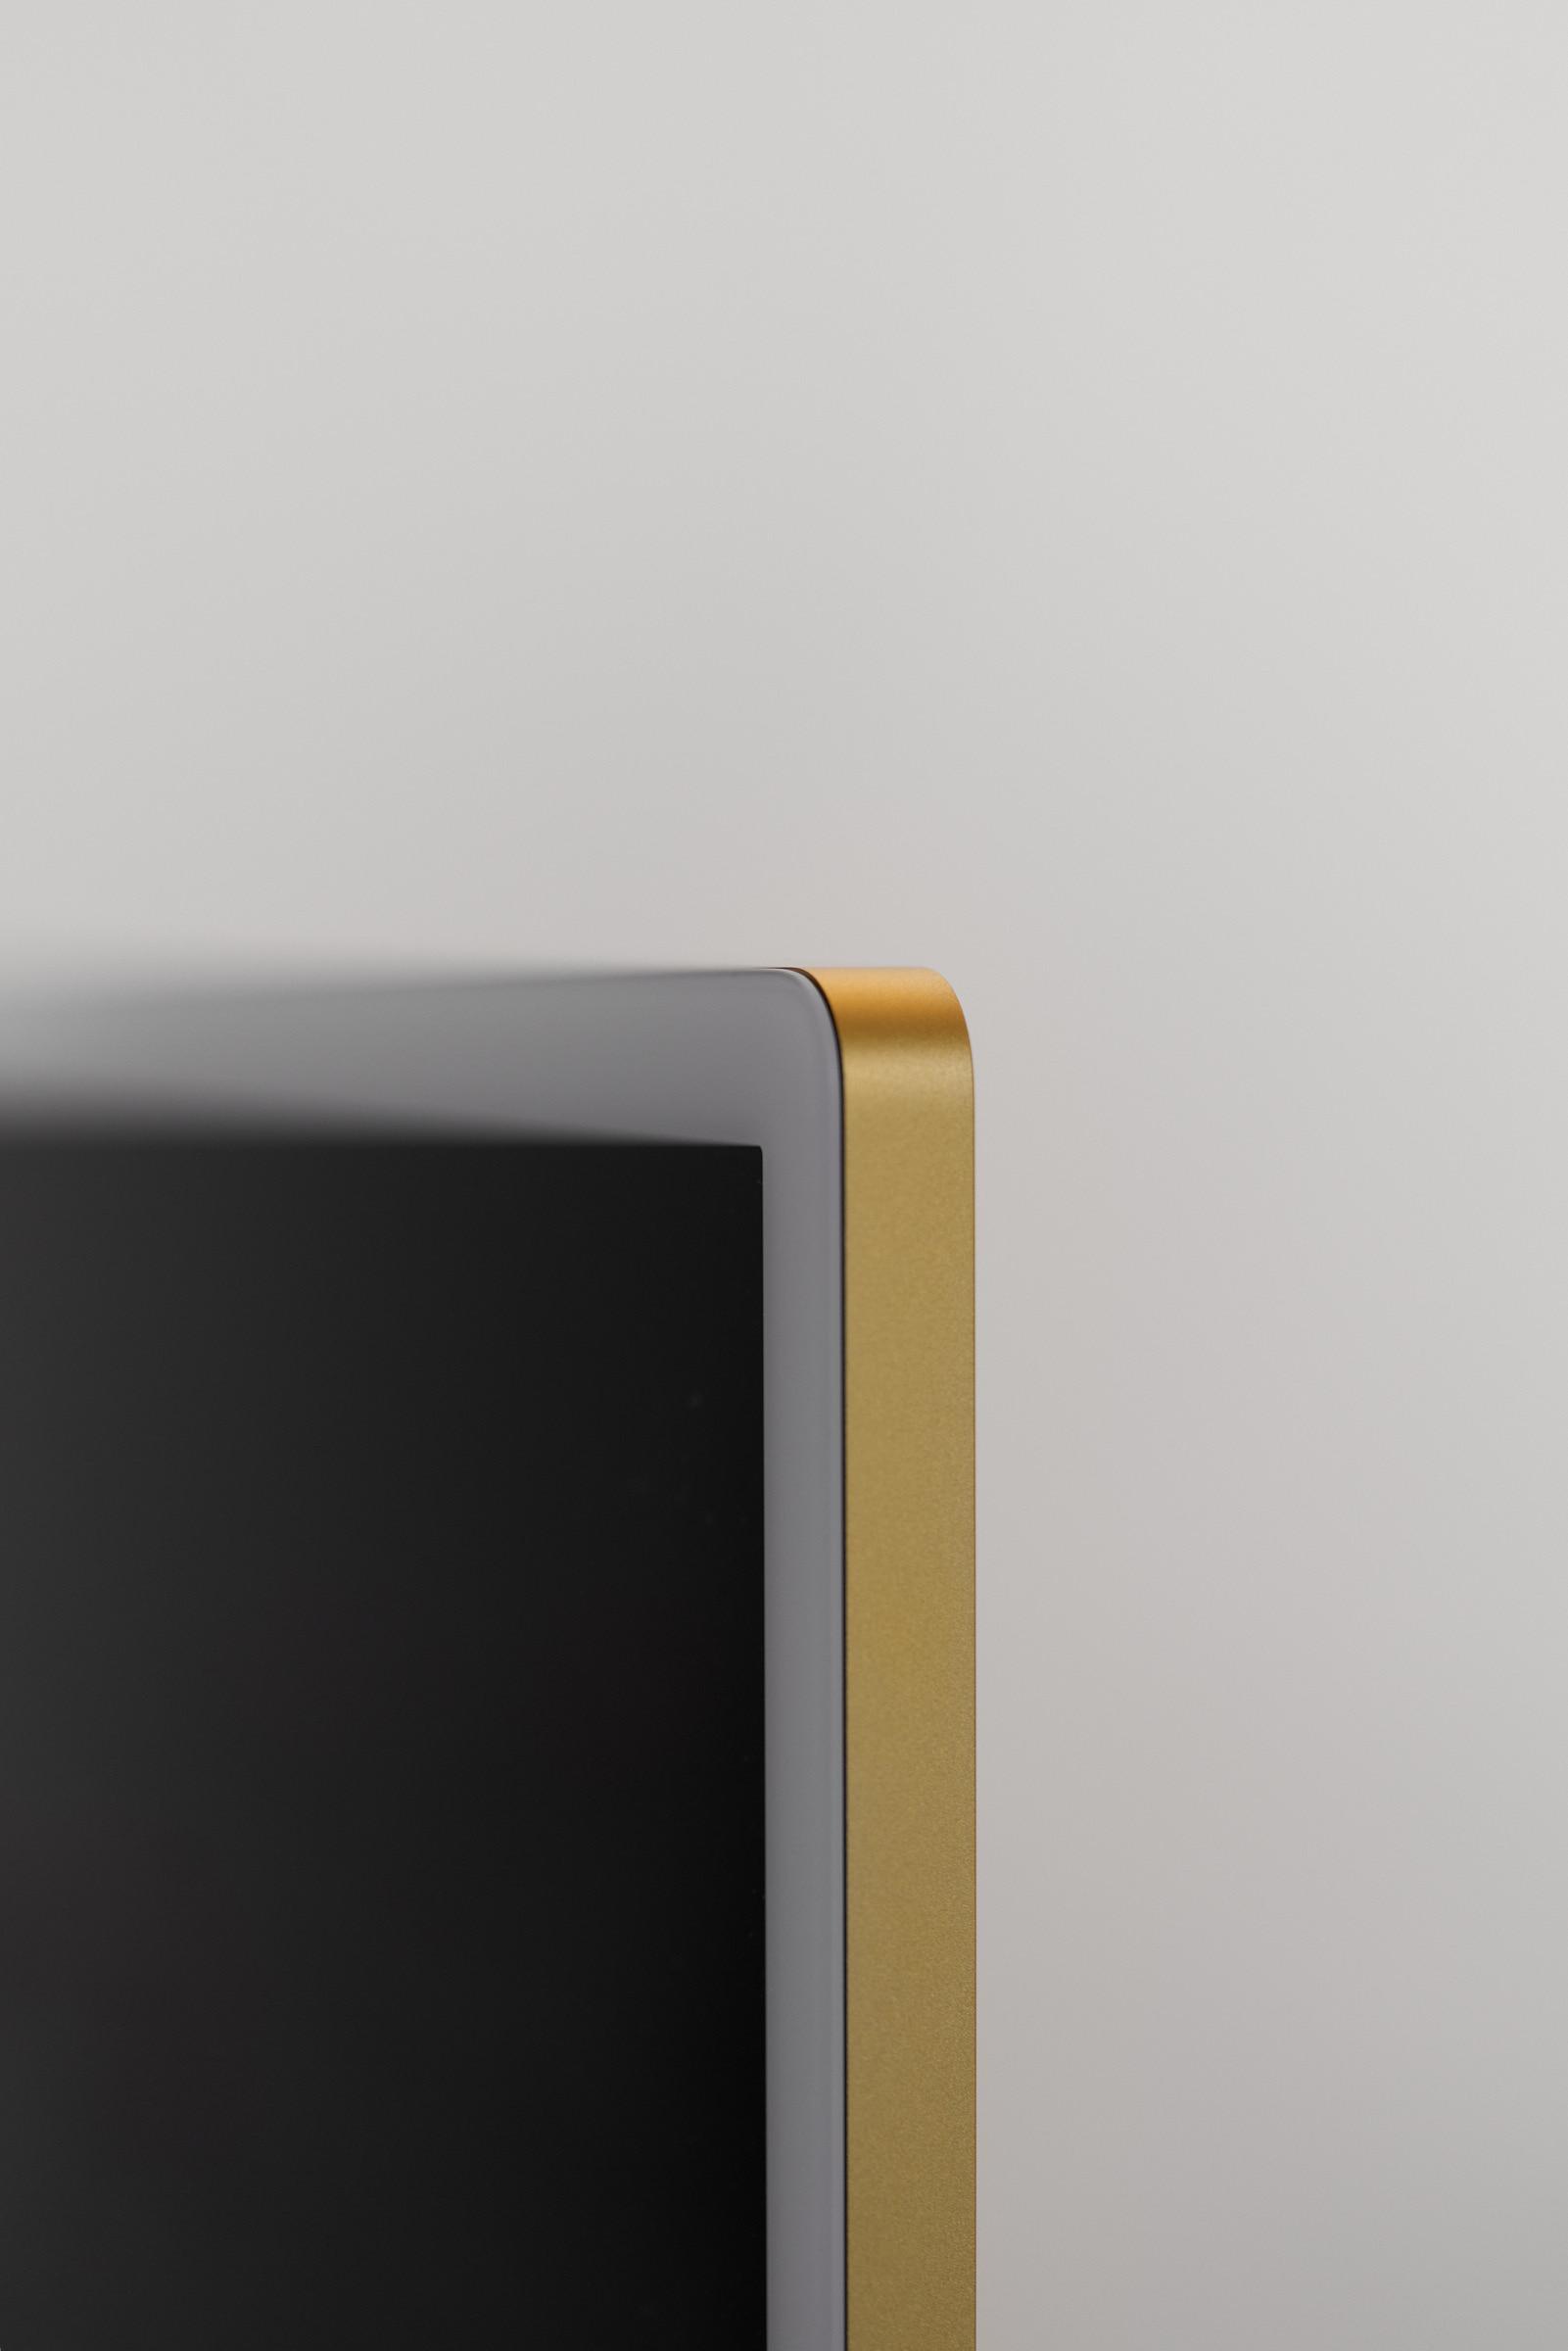 New iMac bezel